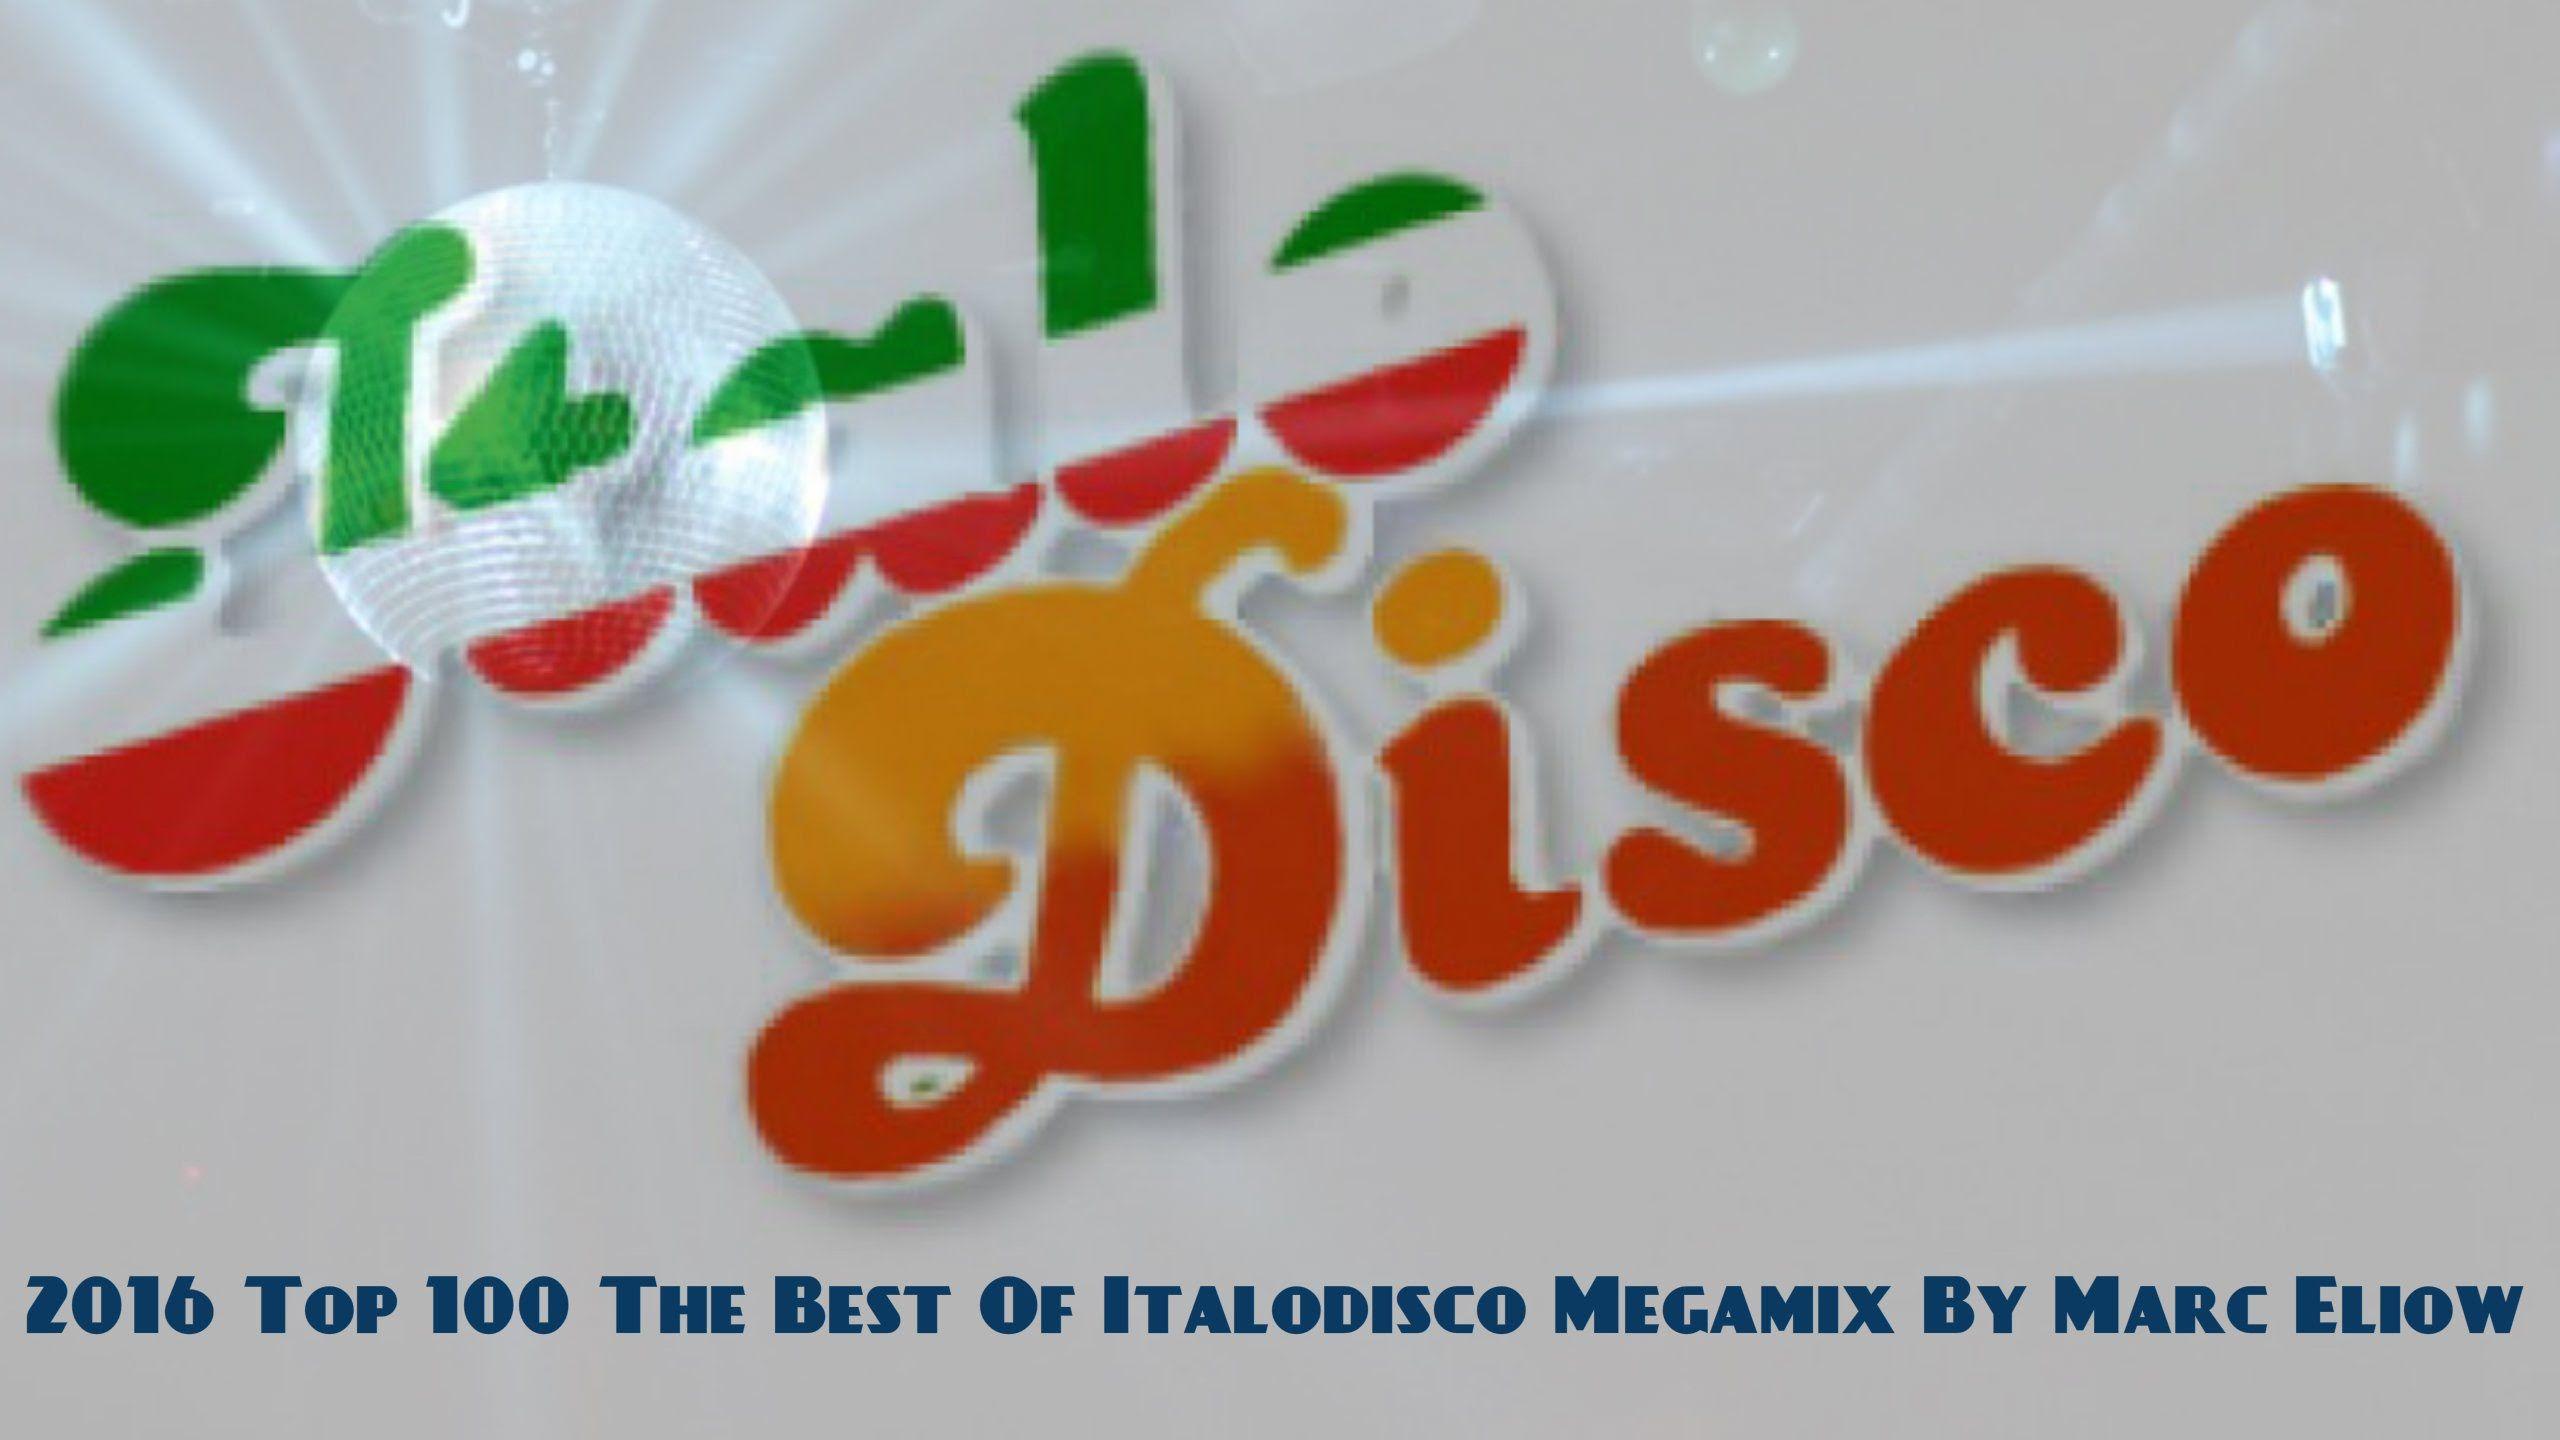 2016 Top 100 The Best Of Italodisco Megamix By Marc Eliow Italo Disco N Music Web High Energy Italo Disco